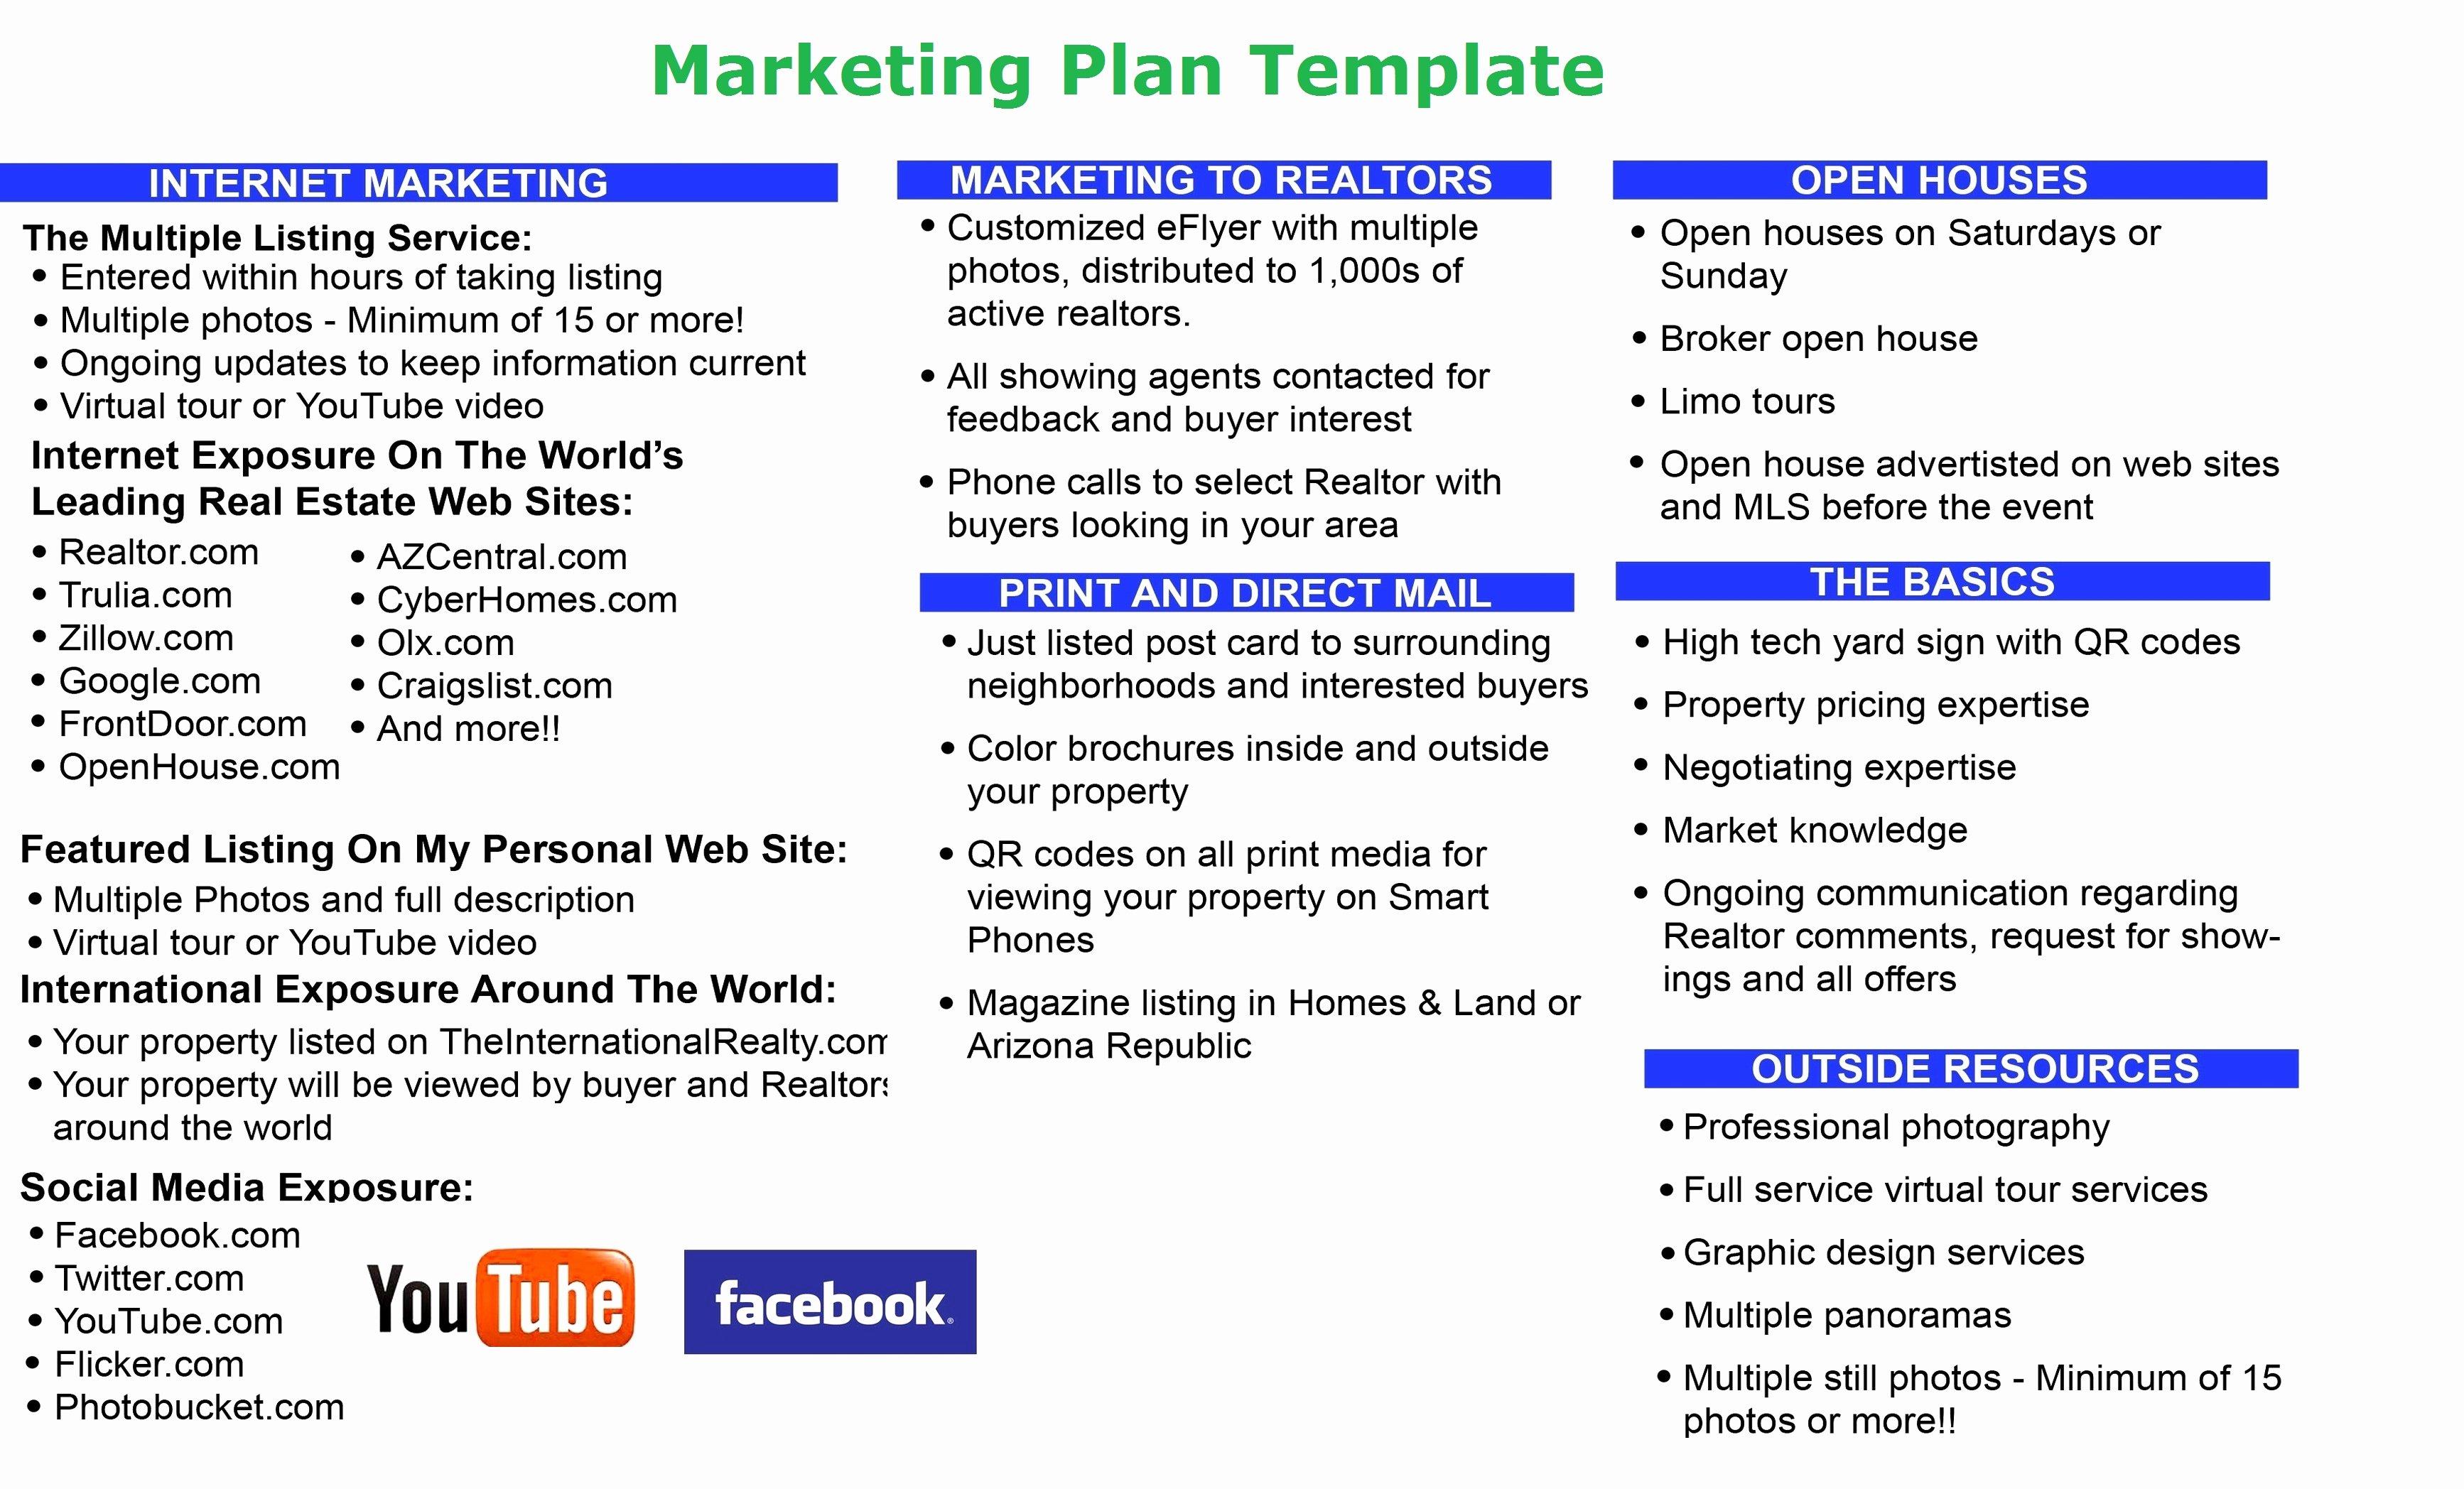 Marketing Plan Outline Template Best Of Marketing Plan